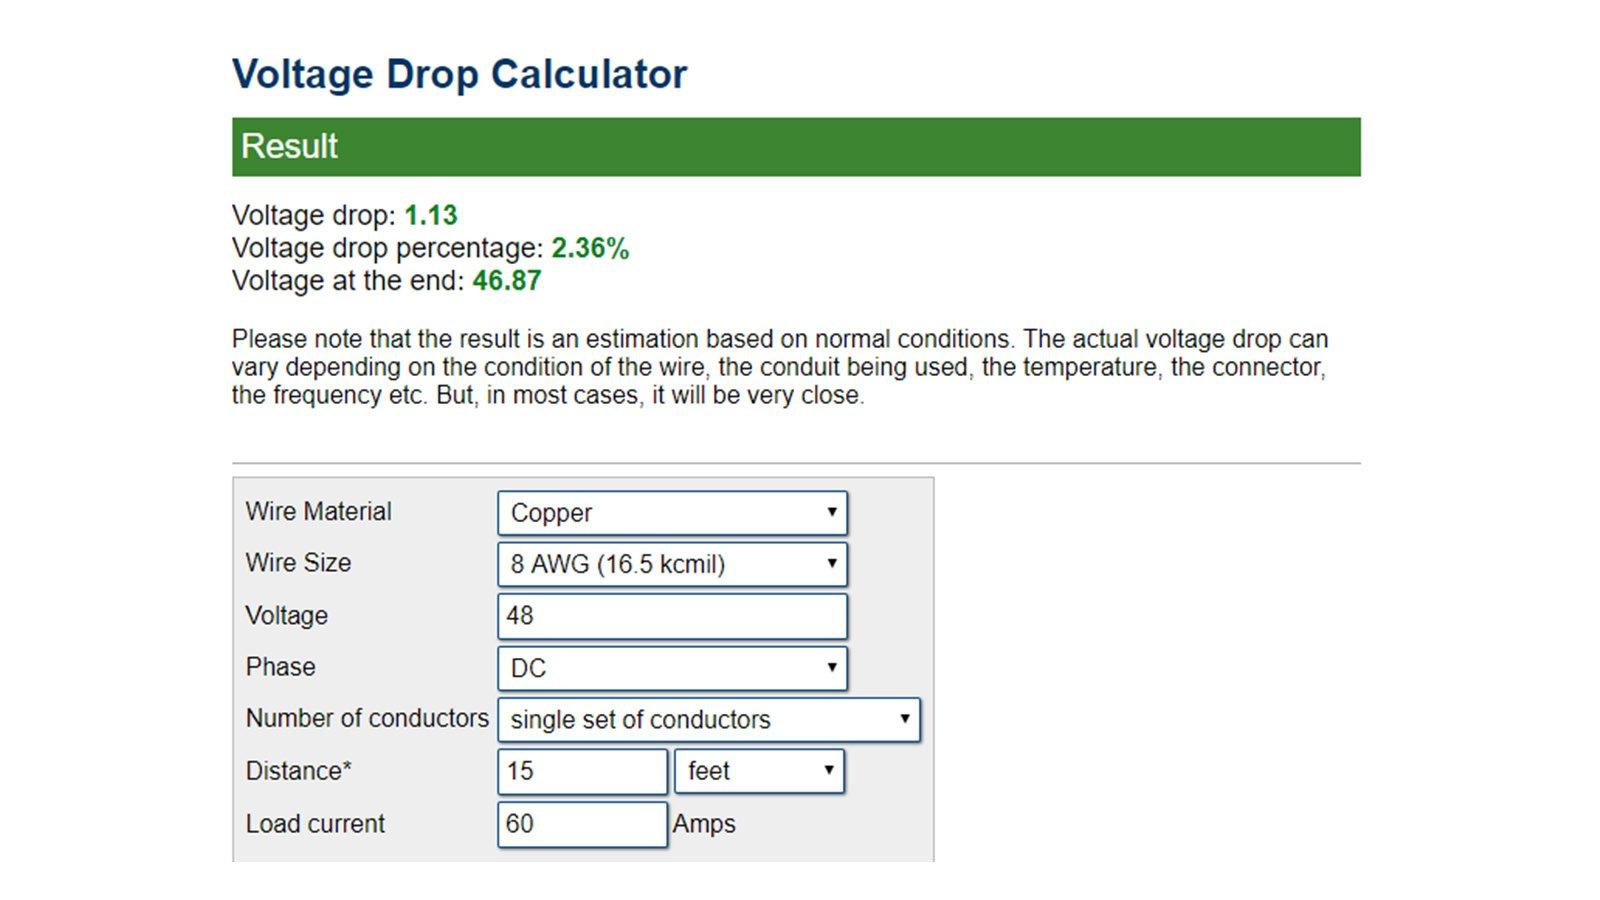 48VDC Voltage Drop / 15 Feet / 8 AWG